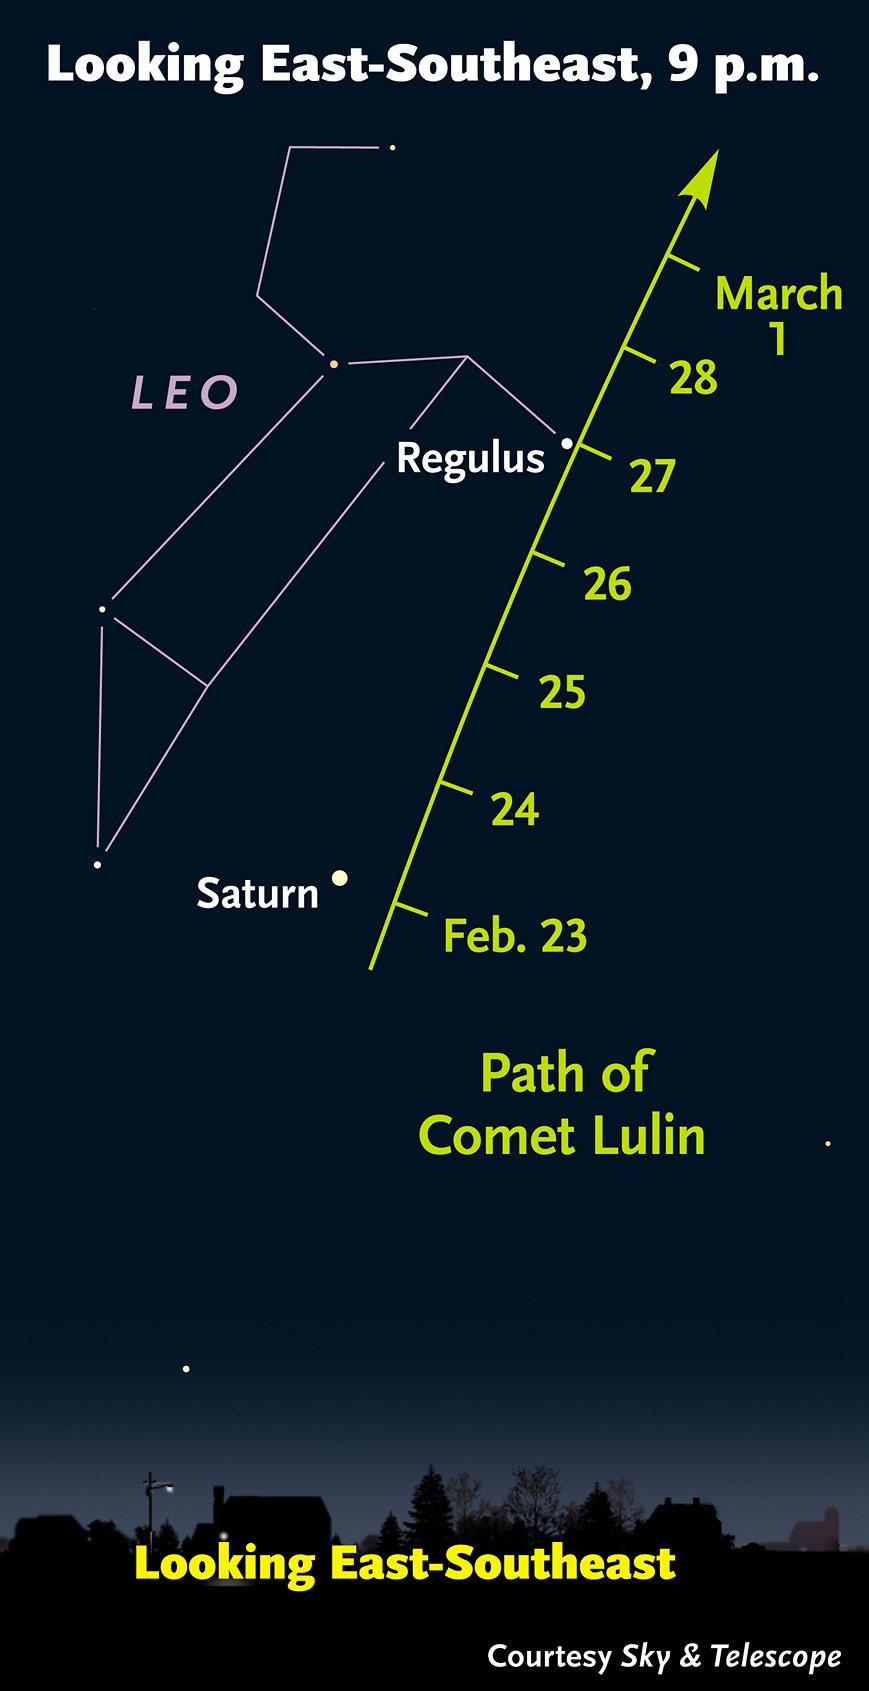 Spotting comet Lulin